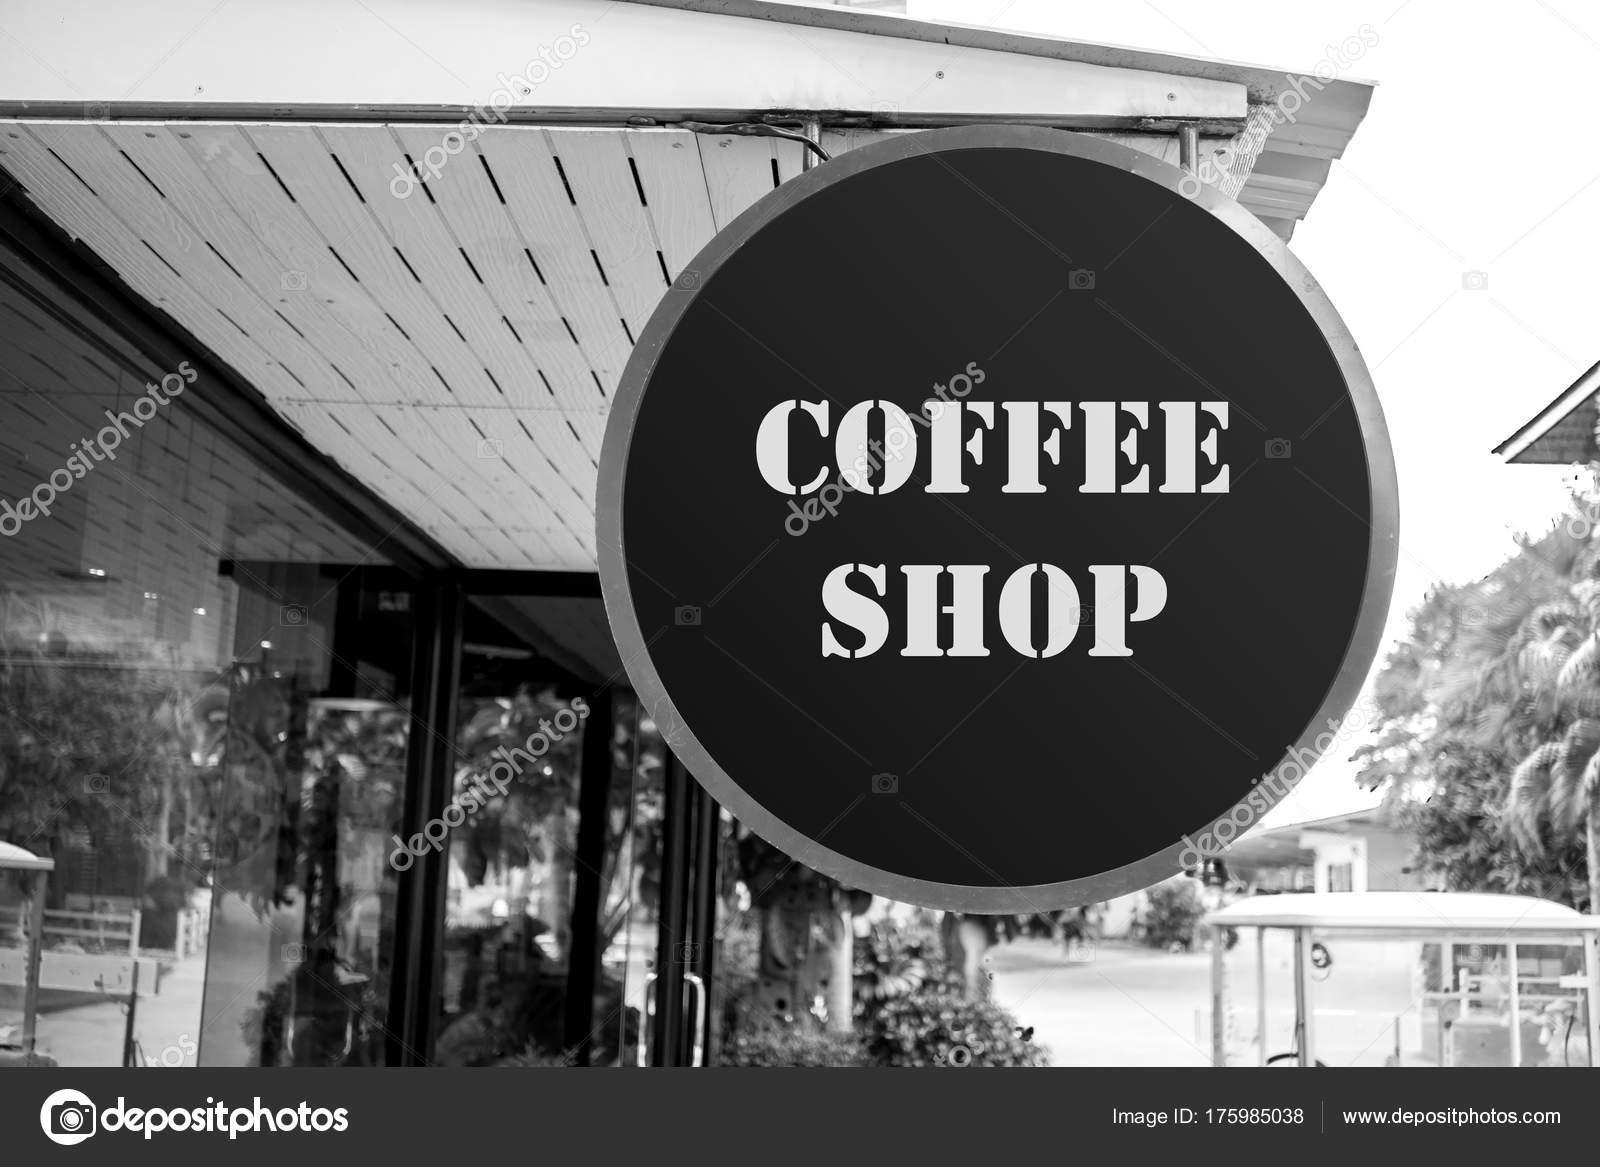 Coffee Shop Board Ideas Coffee Shop Coffee Cafe Sign Board Front Shop Black White Stock Photo C Mantinov 175985038